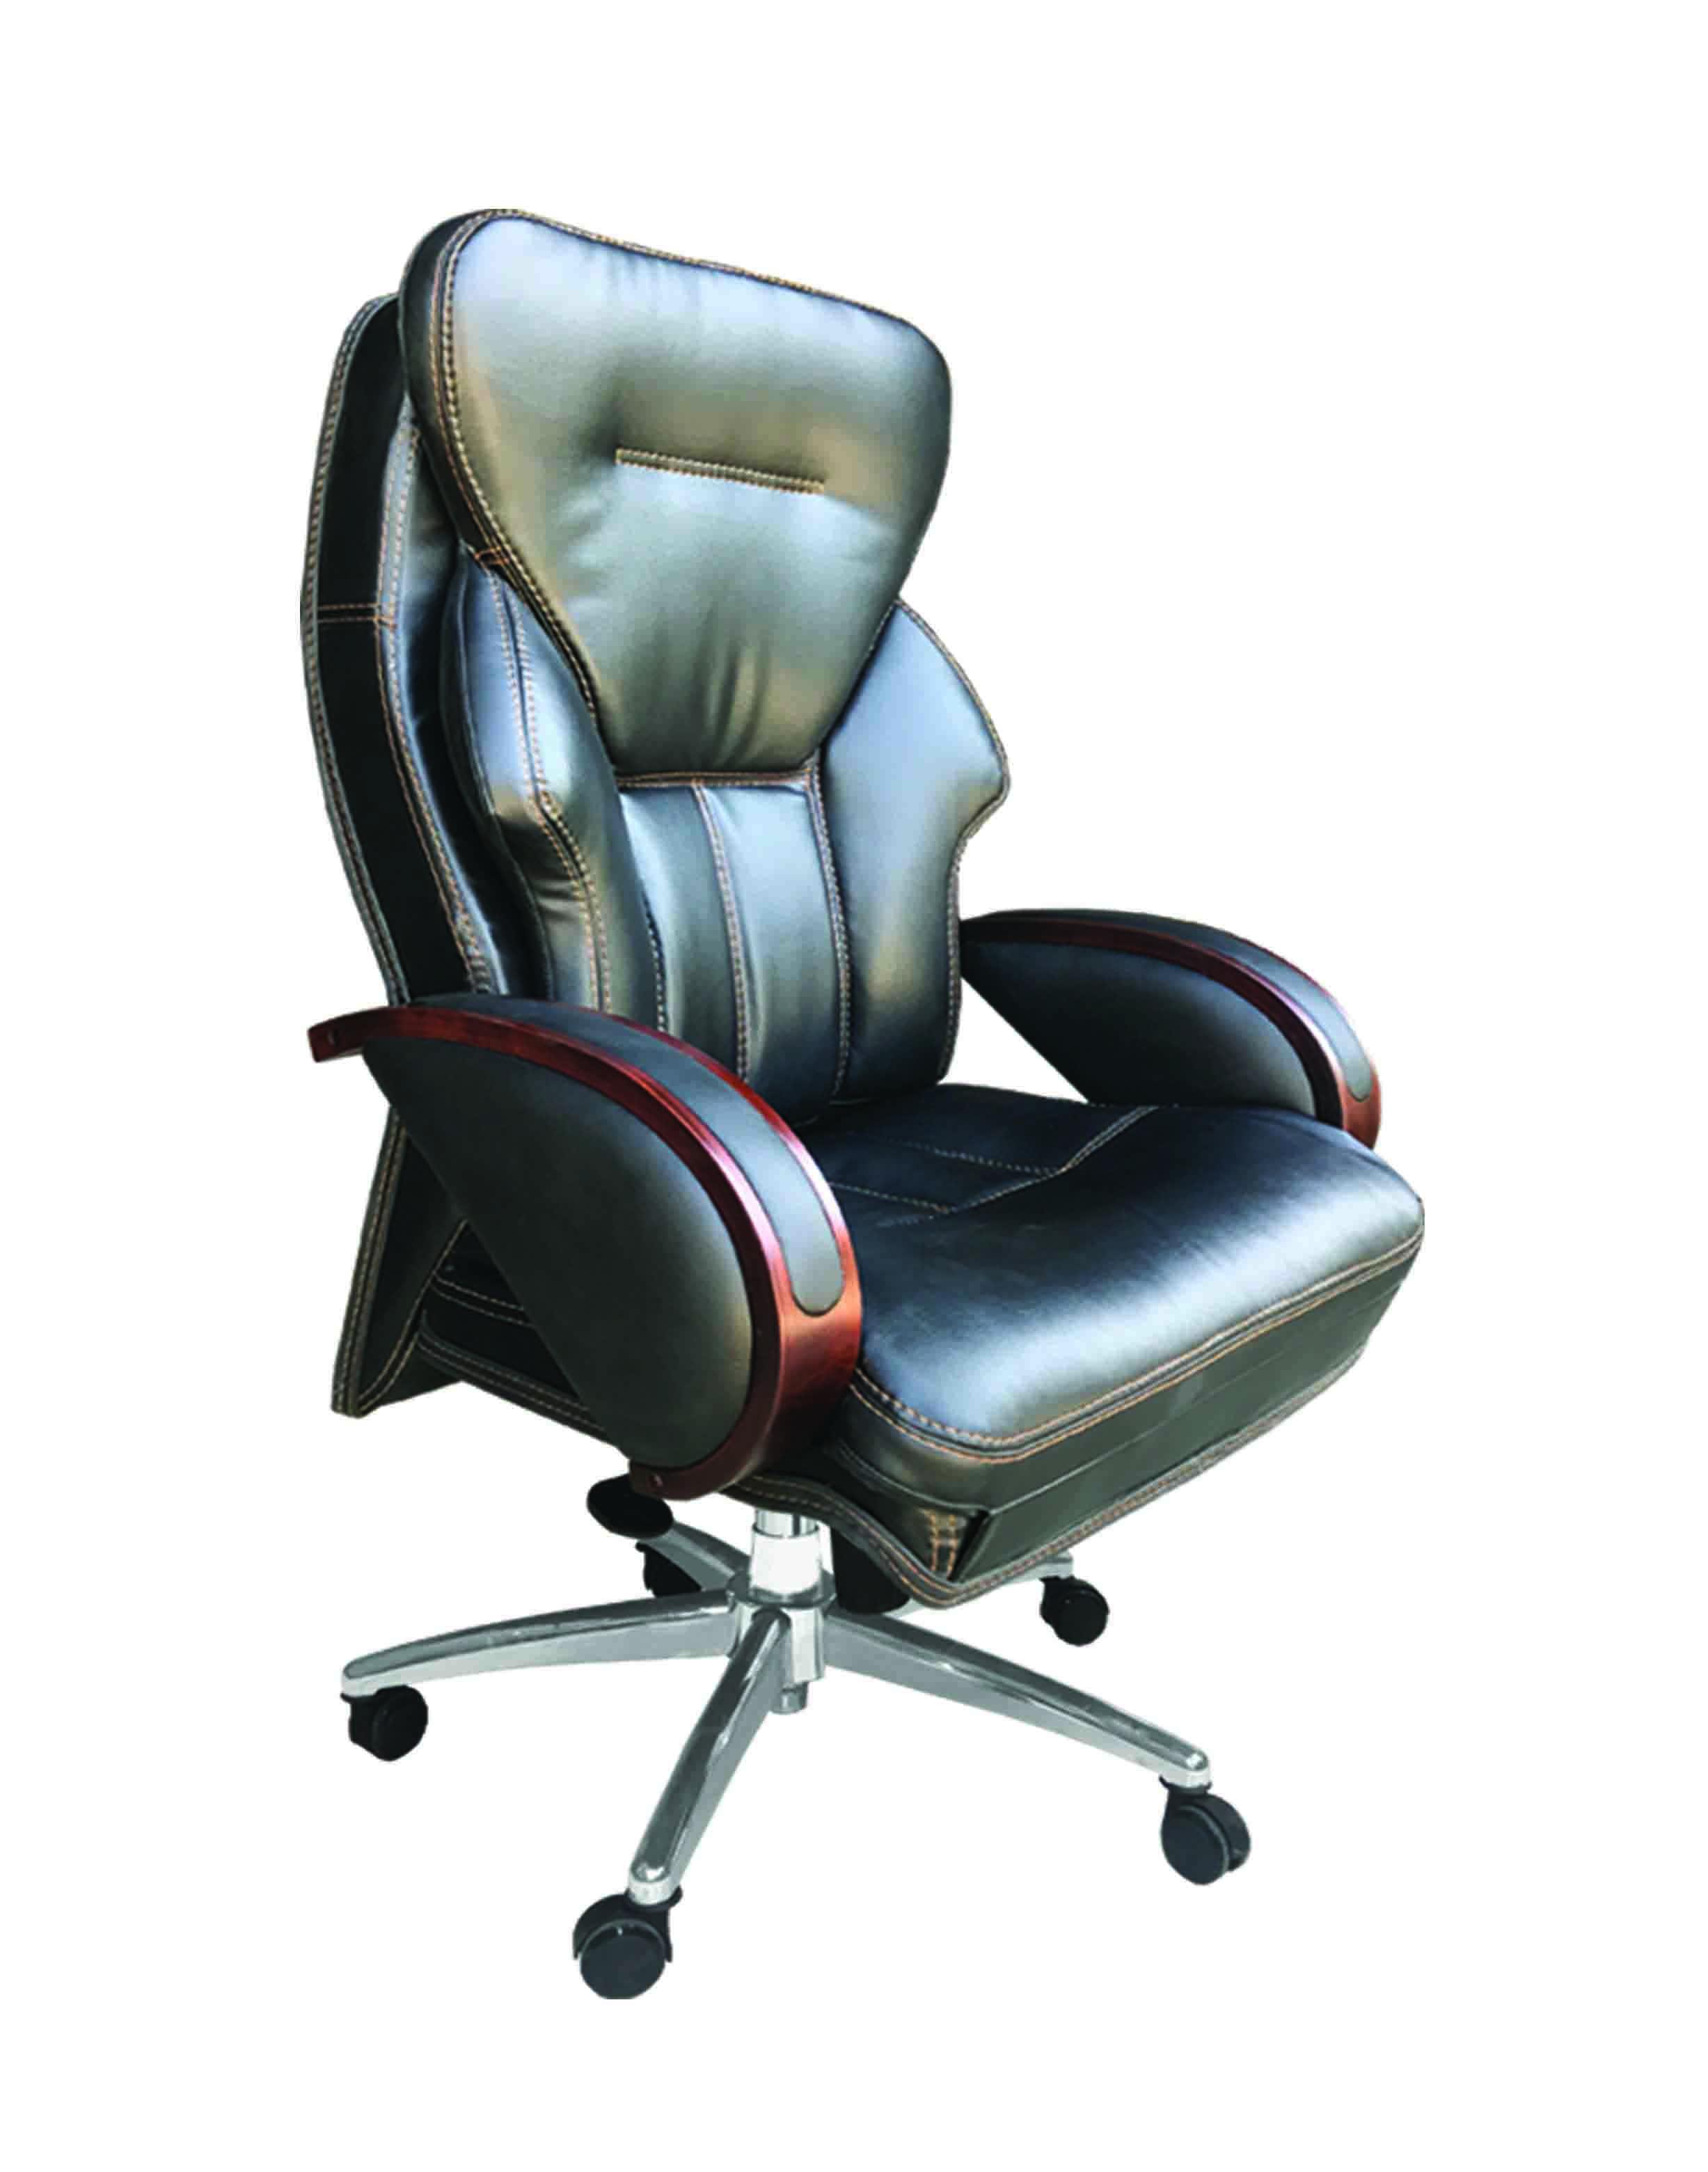 صندلی مدیریت M 930 LXD